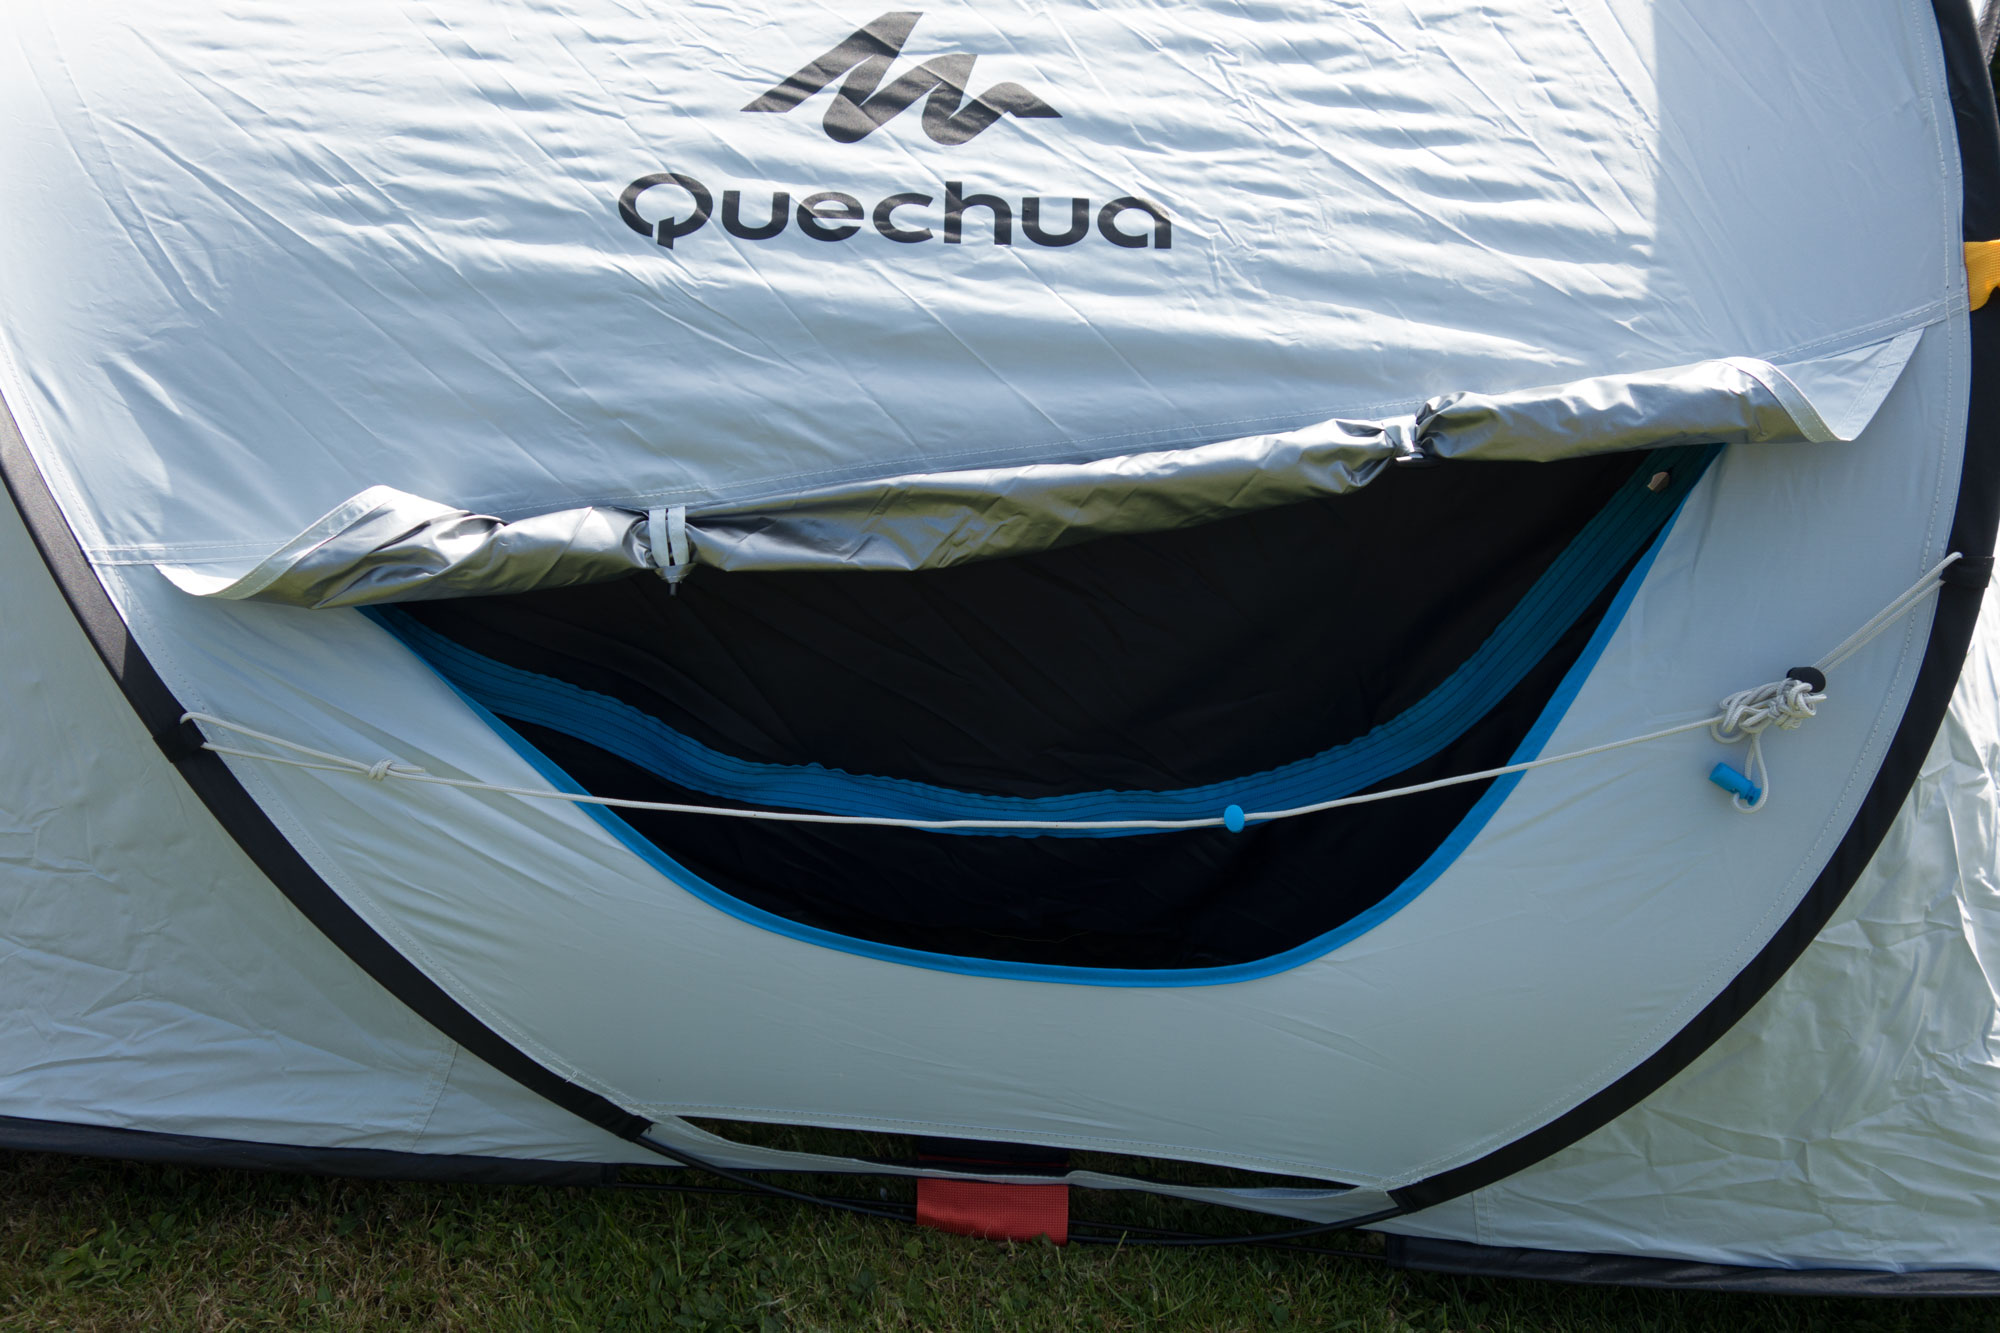 Quechua Zelt Heringe : Quechua fresh black seconds easy outmag